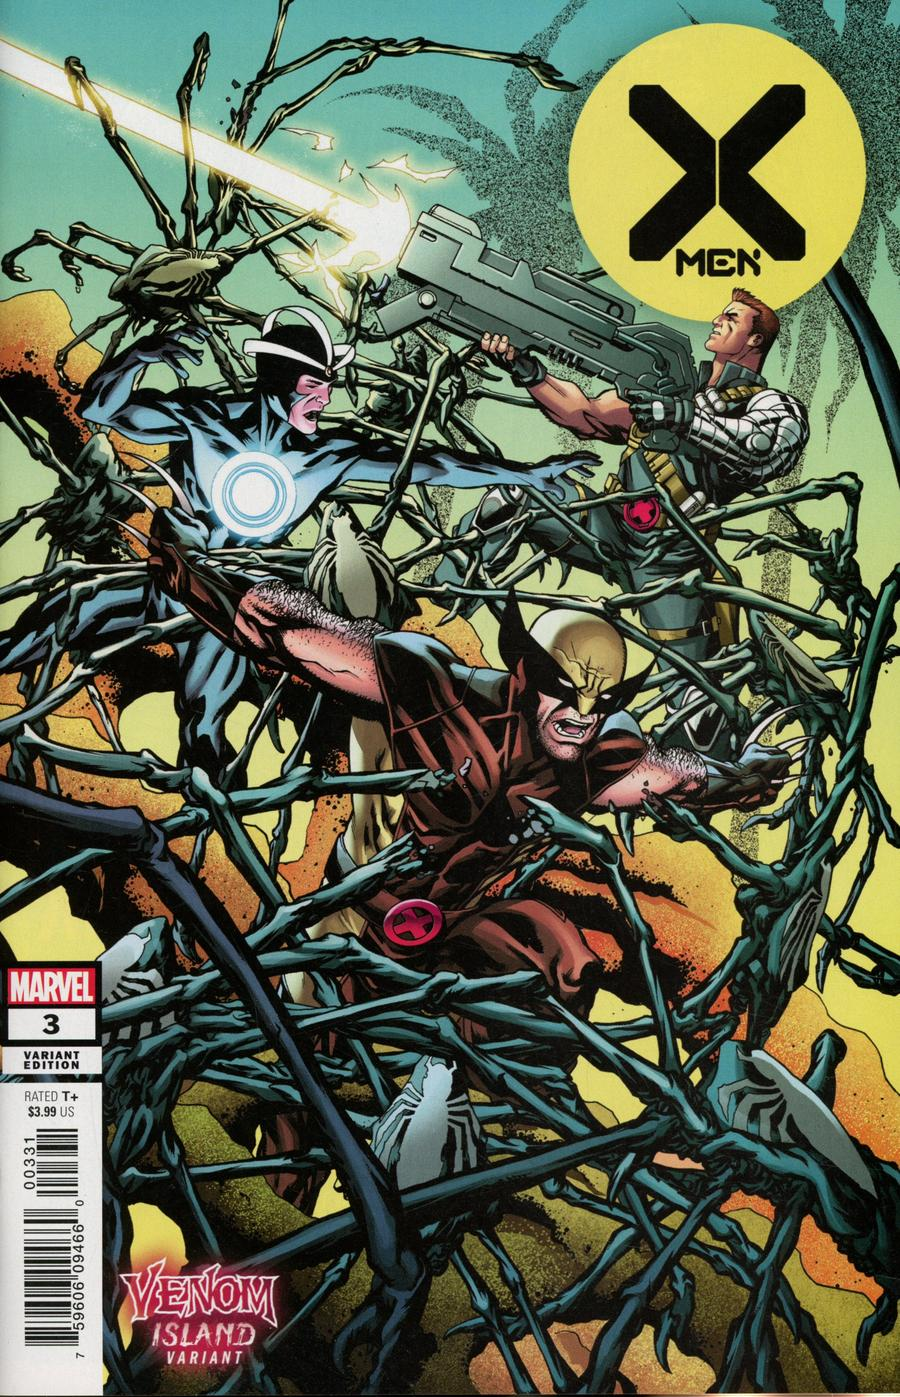 X-Men Vol 5 #3 Cover B Variant Mike McKone Venom Island Cover (Dawn Of X Tie-In)